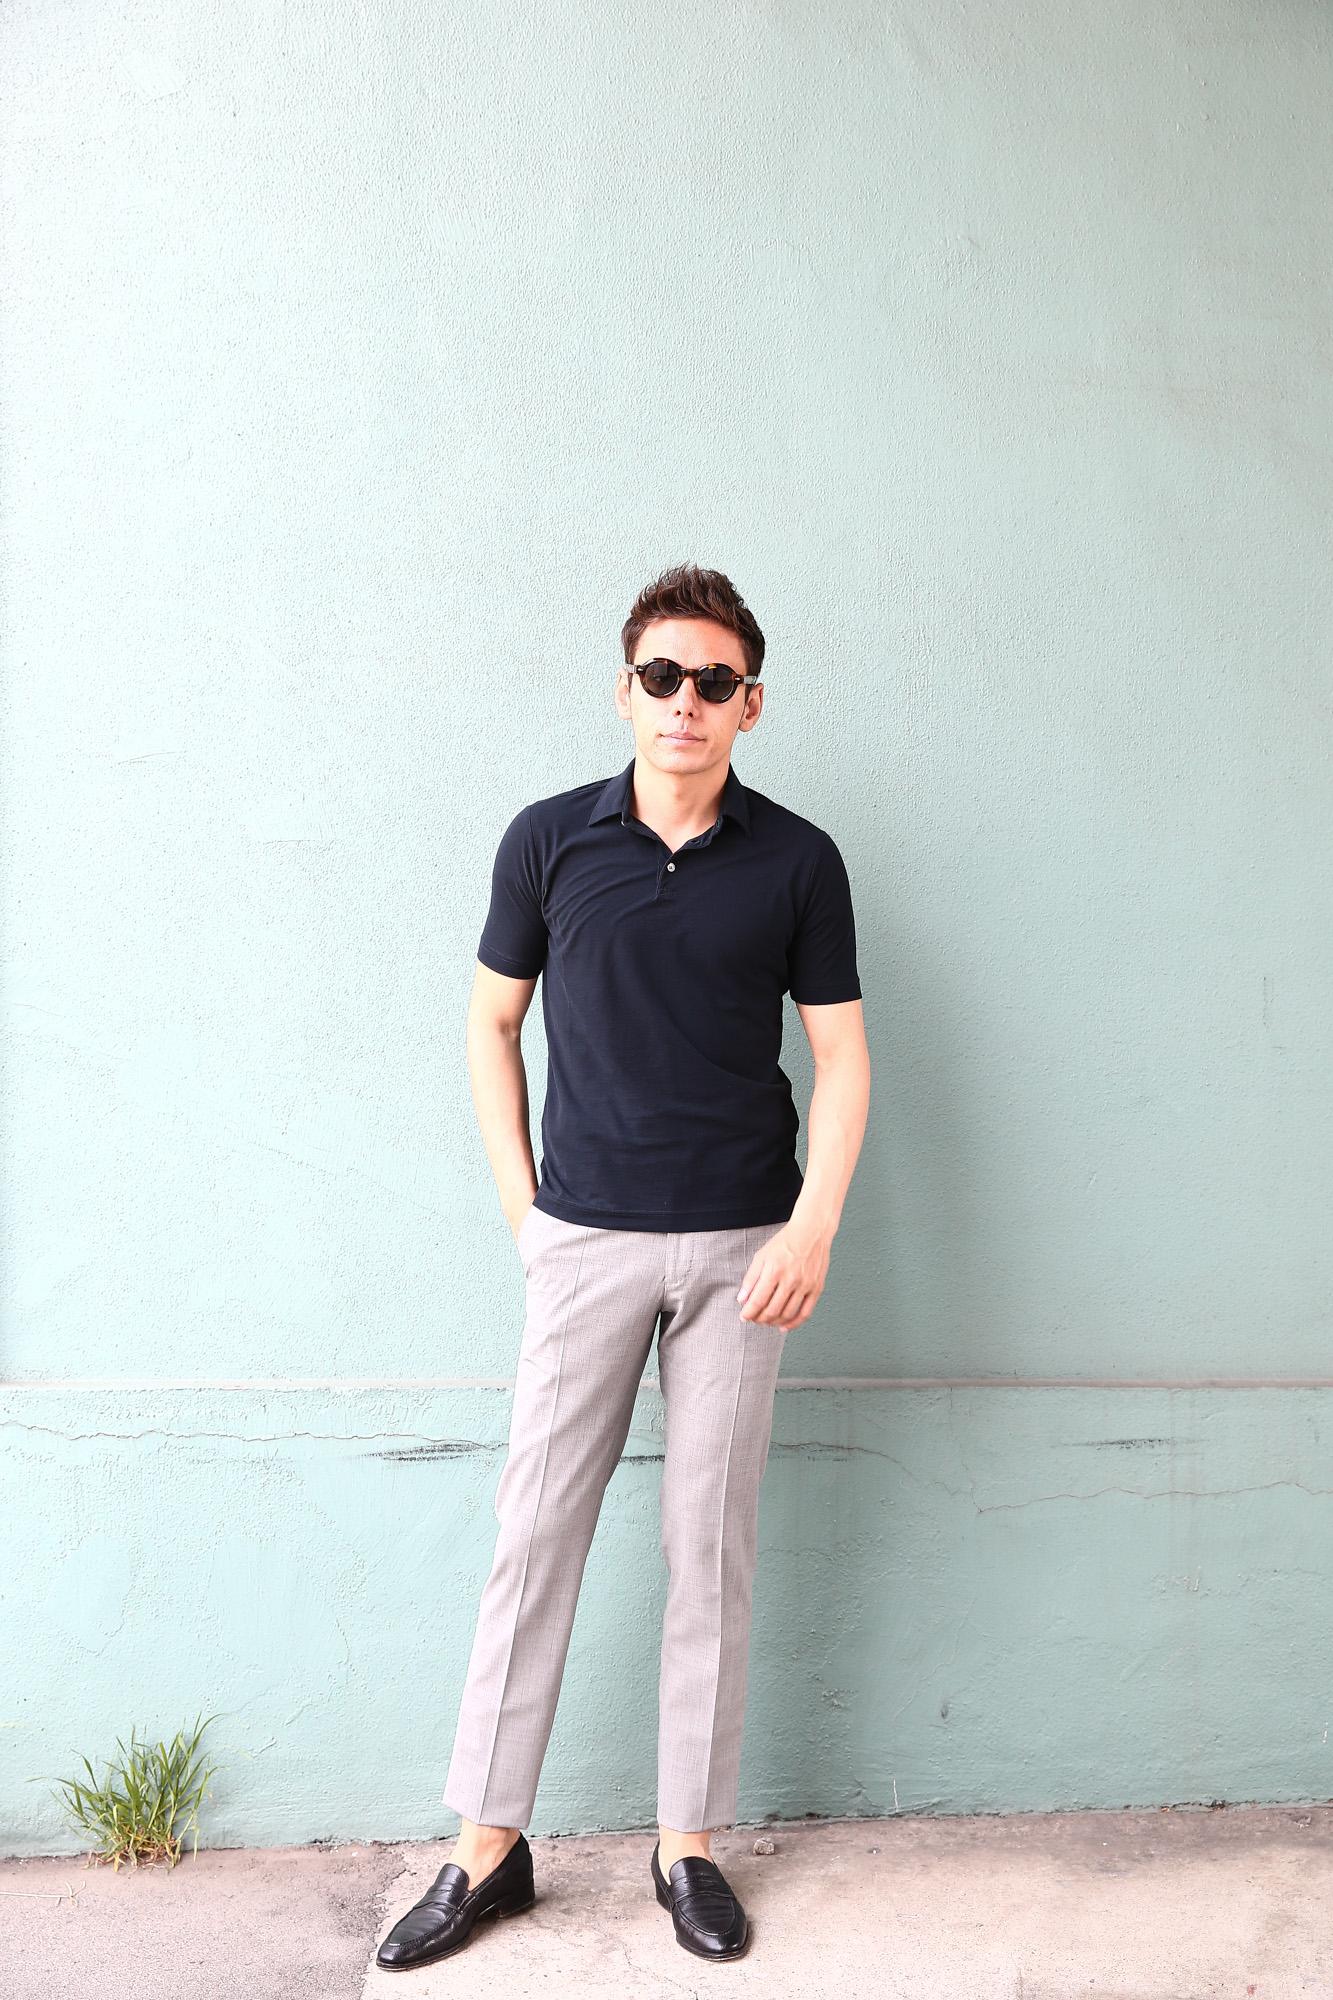 ZANONE (ザノーネ) Polo Shirt ice cotton アイスコットン ポロシャツ NAVY (ネイビー・Z0542) made in italy (イタリア製) 2018 春夏新作 愛知 名古屋 ZODIAC ゾディアック ポロ ニットポロ